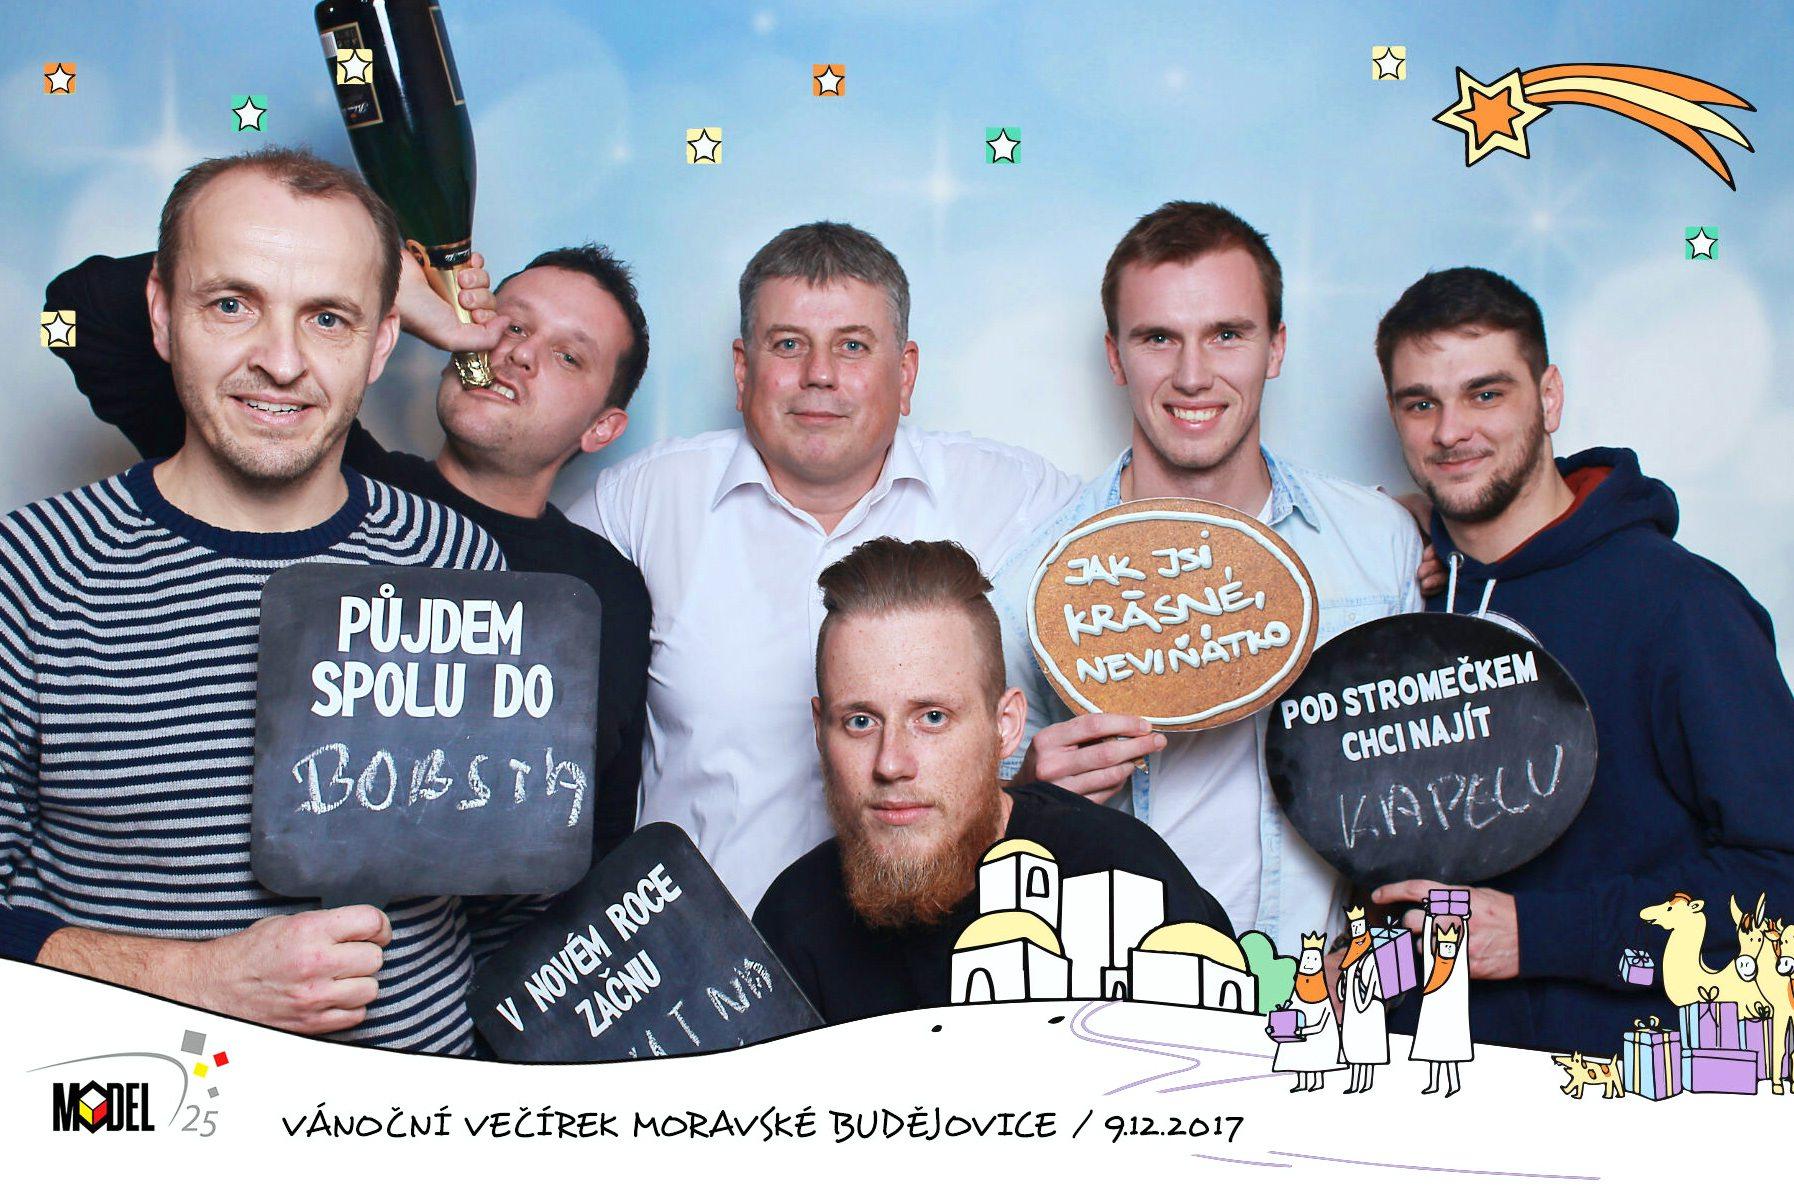 fotokoutek-ceske-budejovice-vanocni-vecirek-model-vanocni-vecirek-9-12-2017-358842